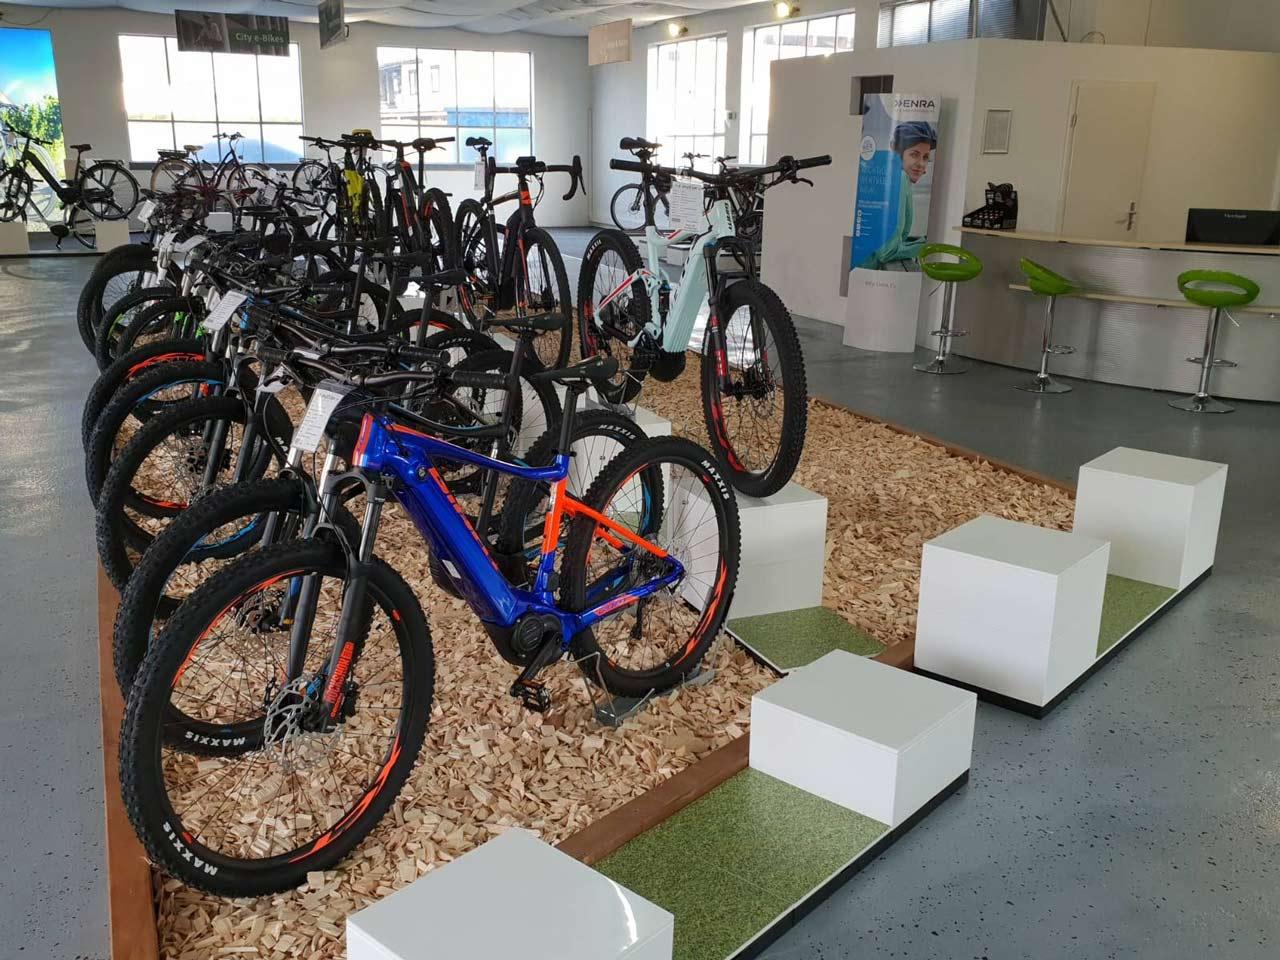 große e-Bike Markenauswahl in der e-motion e-Bike Welt Karlsruhe